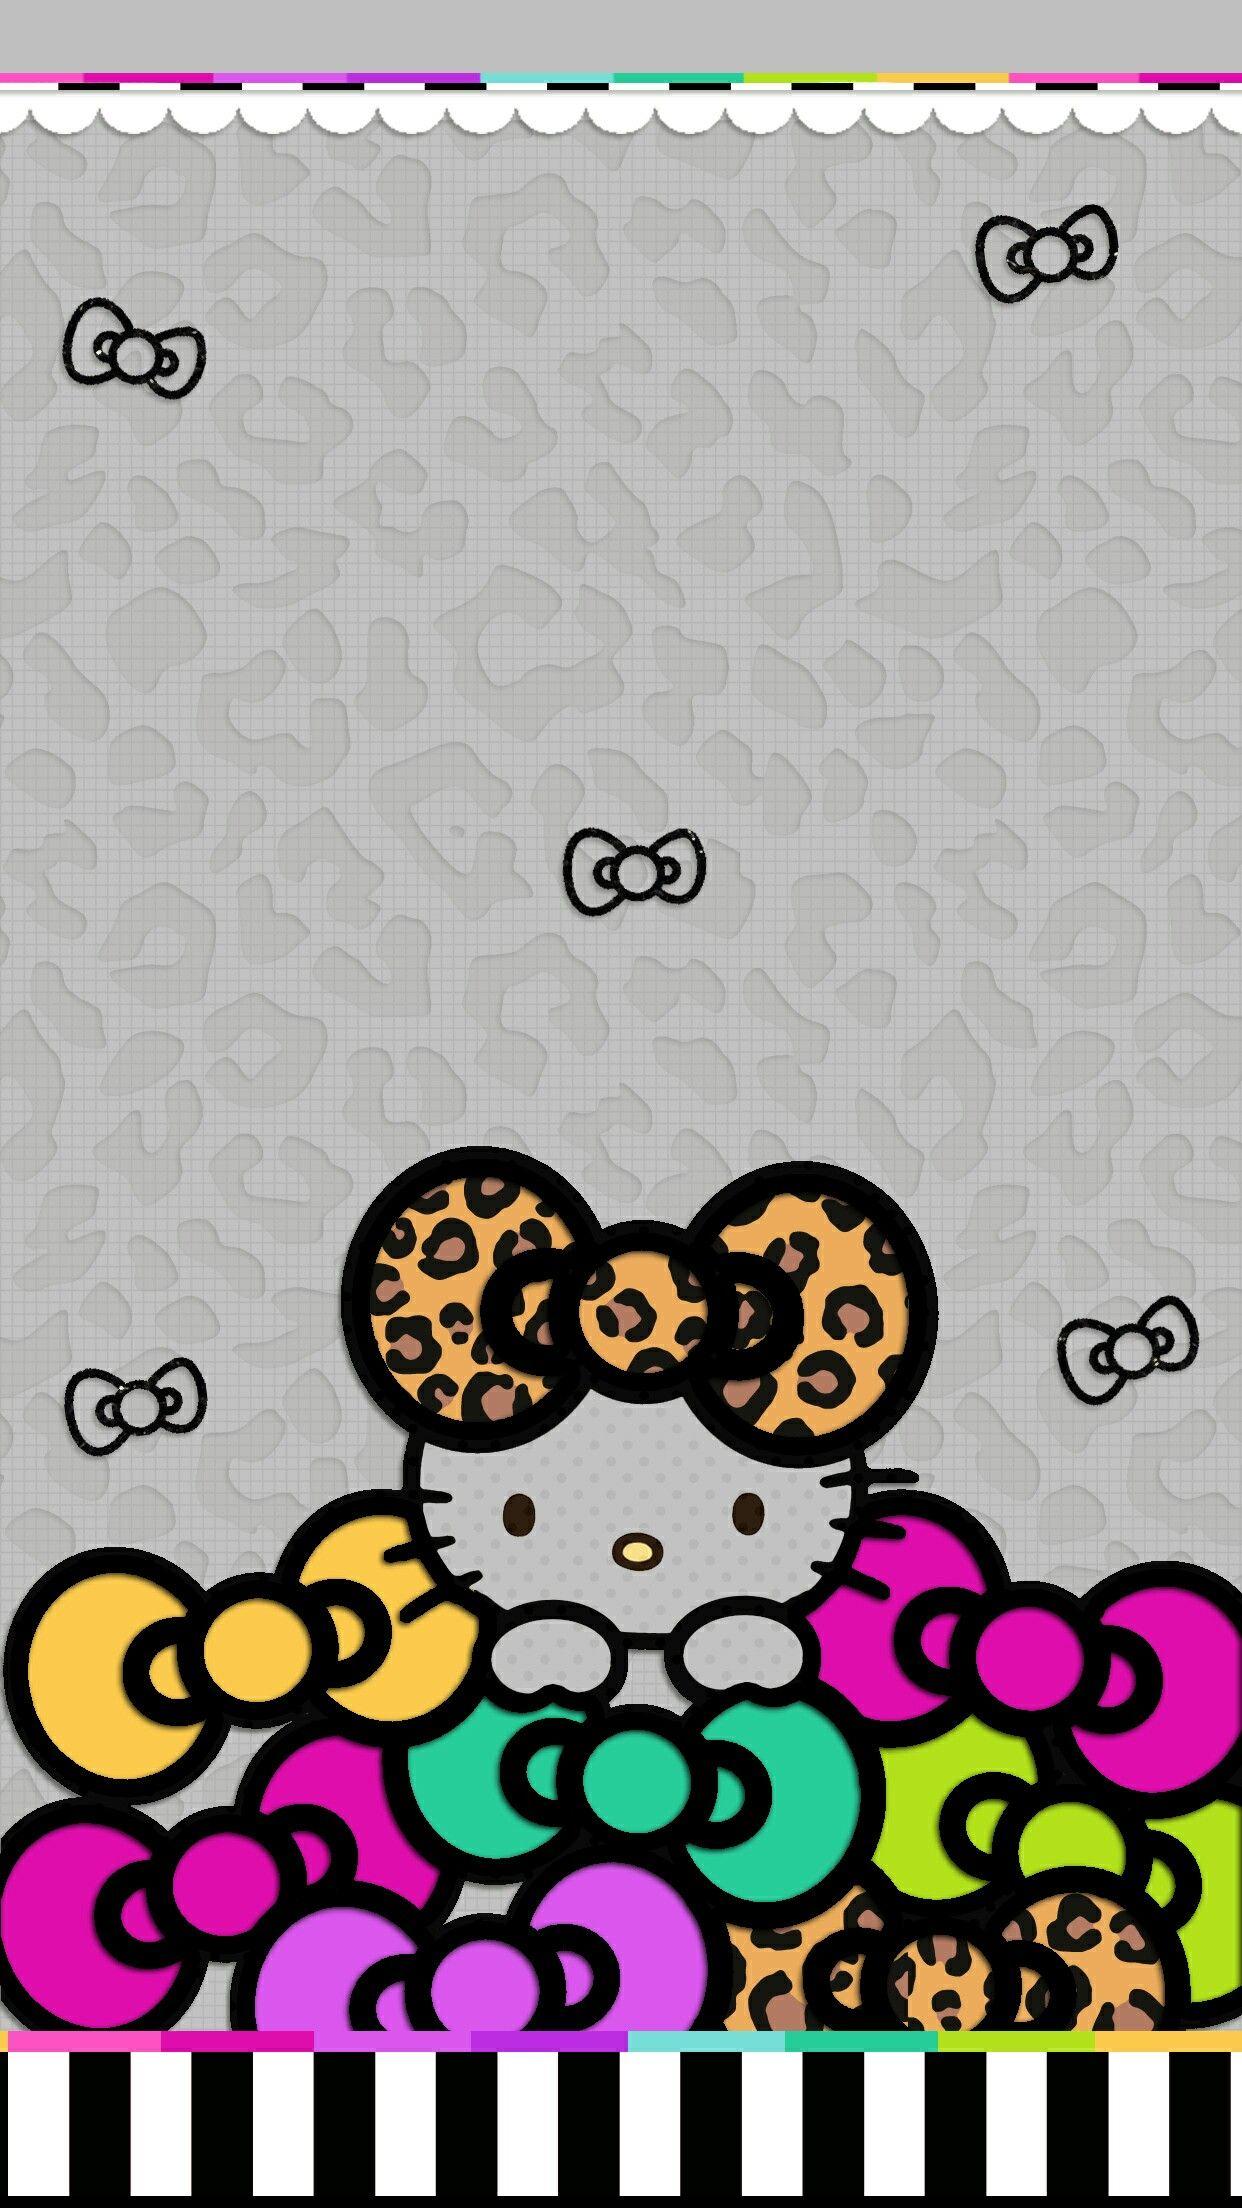 Simple Wallpaper Hello Kitty Iphone 4 - cd82ea08fb71d4265a28c41b3108364b  Gallery_82766.jpg